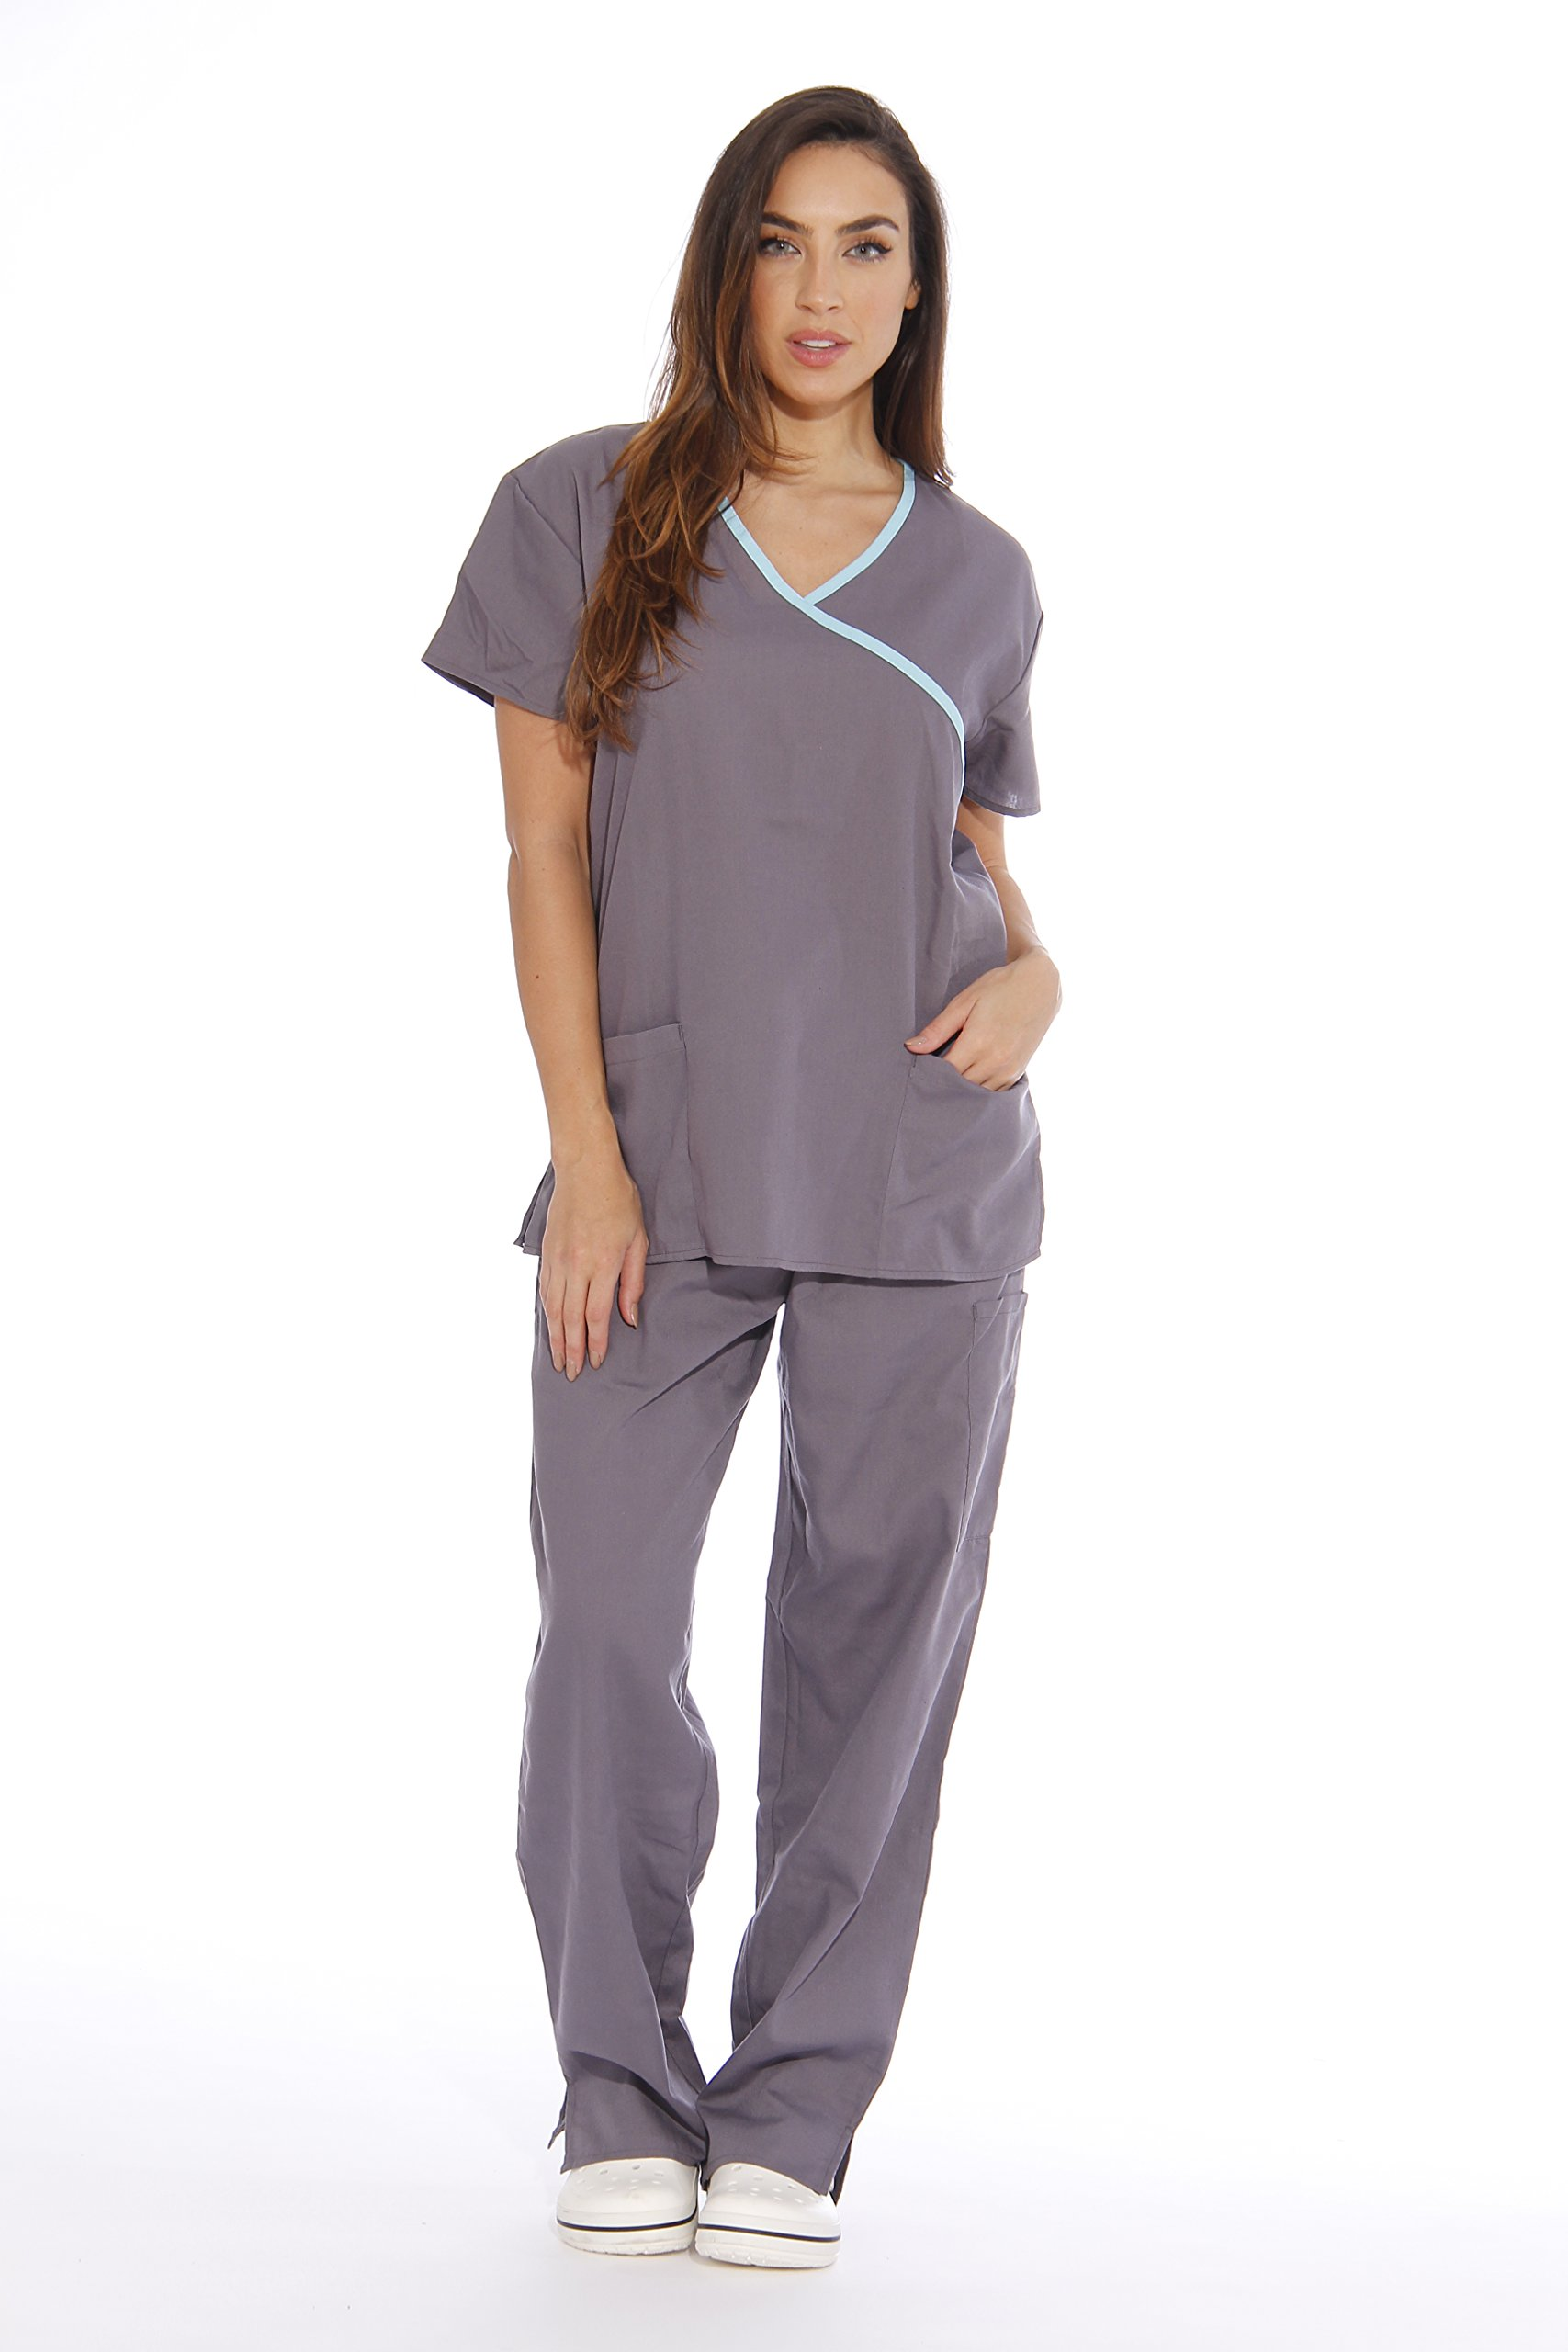 addc4ccca64 Galleon - 11150W Just Love Women's Scrub Sets / Medical Scrubs / Nursing  Scrubs - M, Steel Grey With Aqua Trim,Steel Grey With Aqua Trim,Medium